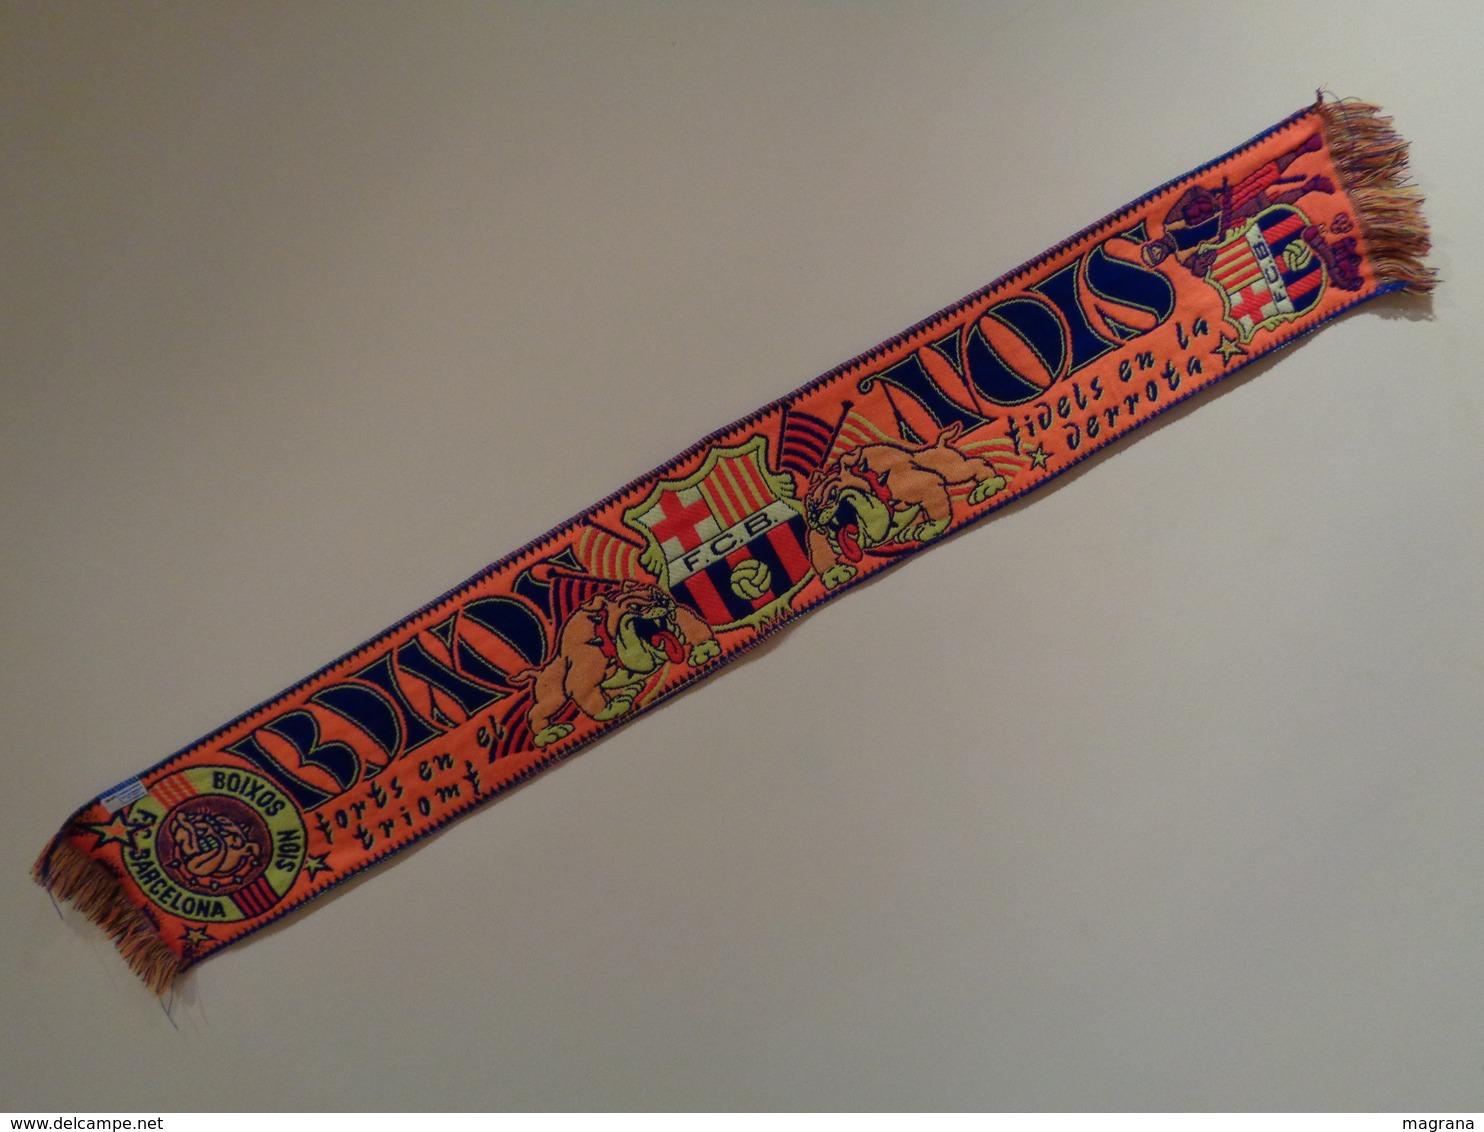 Bufanda (scarf) Naranja. Boixos Nois Del Futbol Club Barcelona. 145 X 20 Cm - Uniformes Recordatorios & Misc